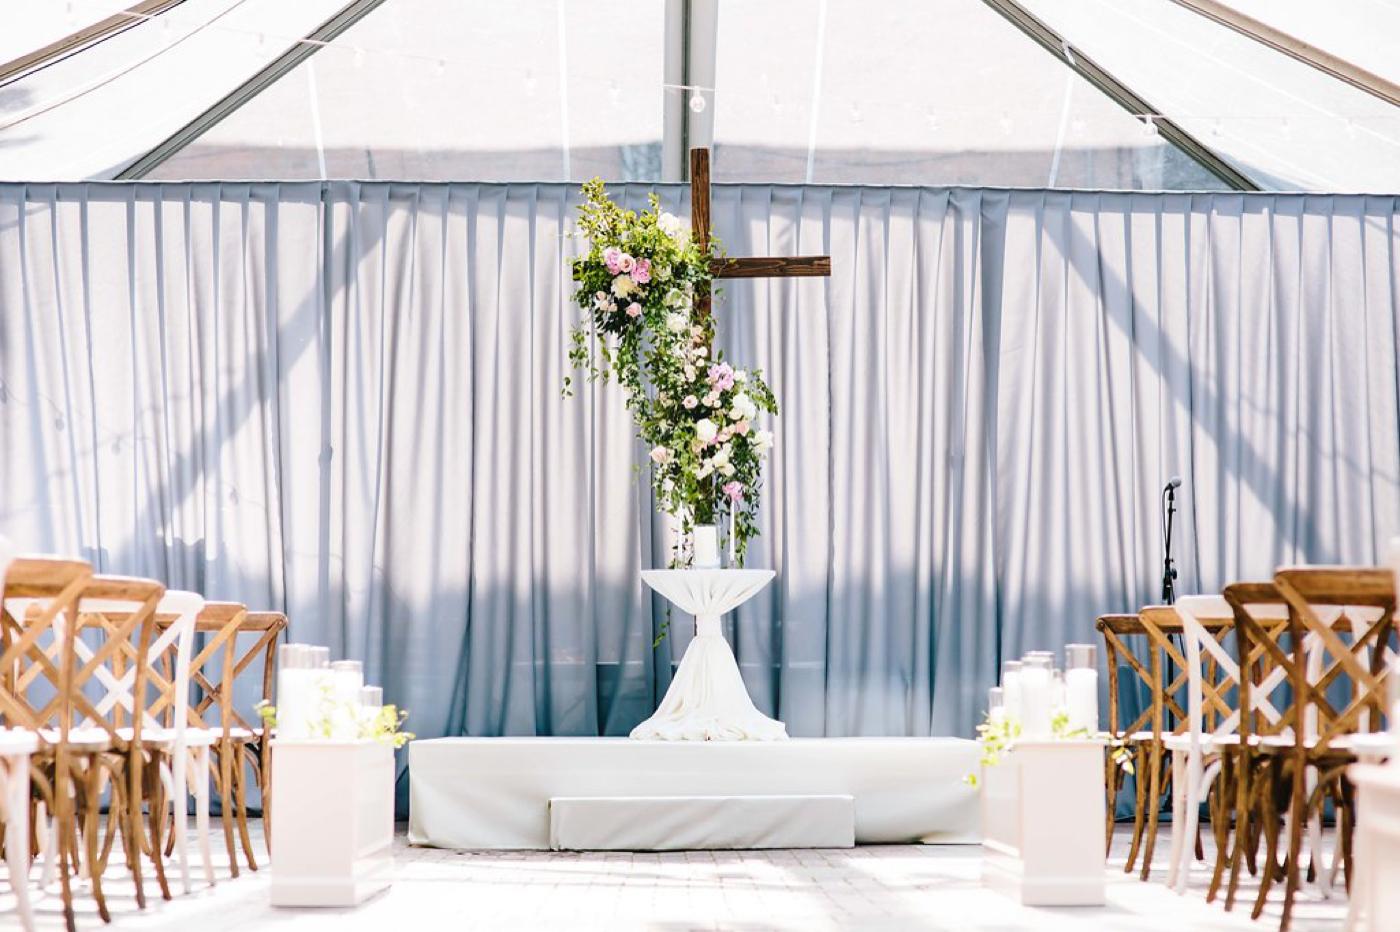 chicago-fine-art-wedding-photography-sakamuri36